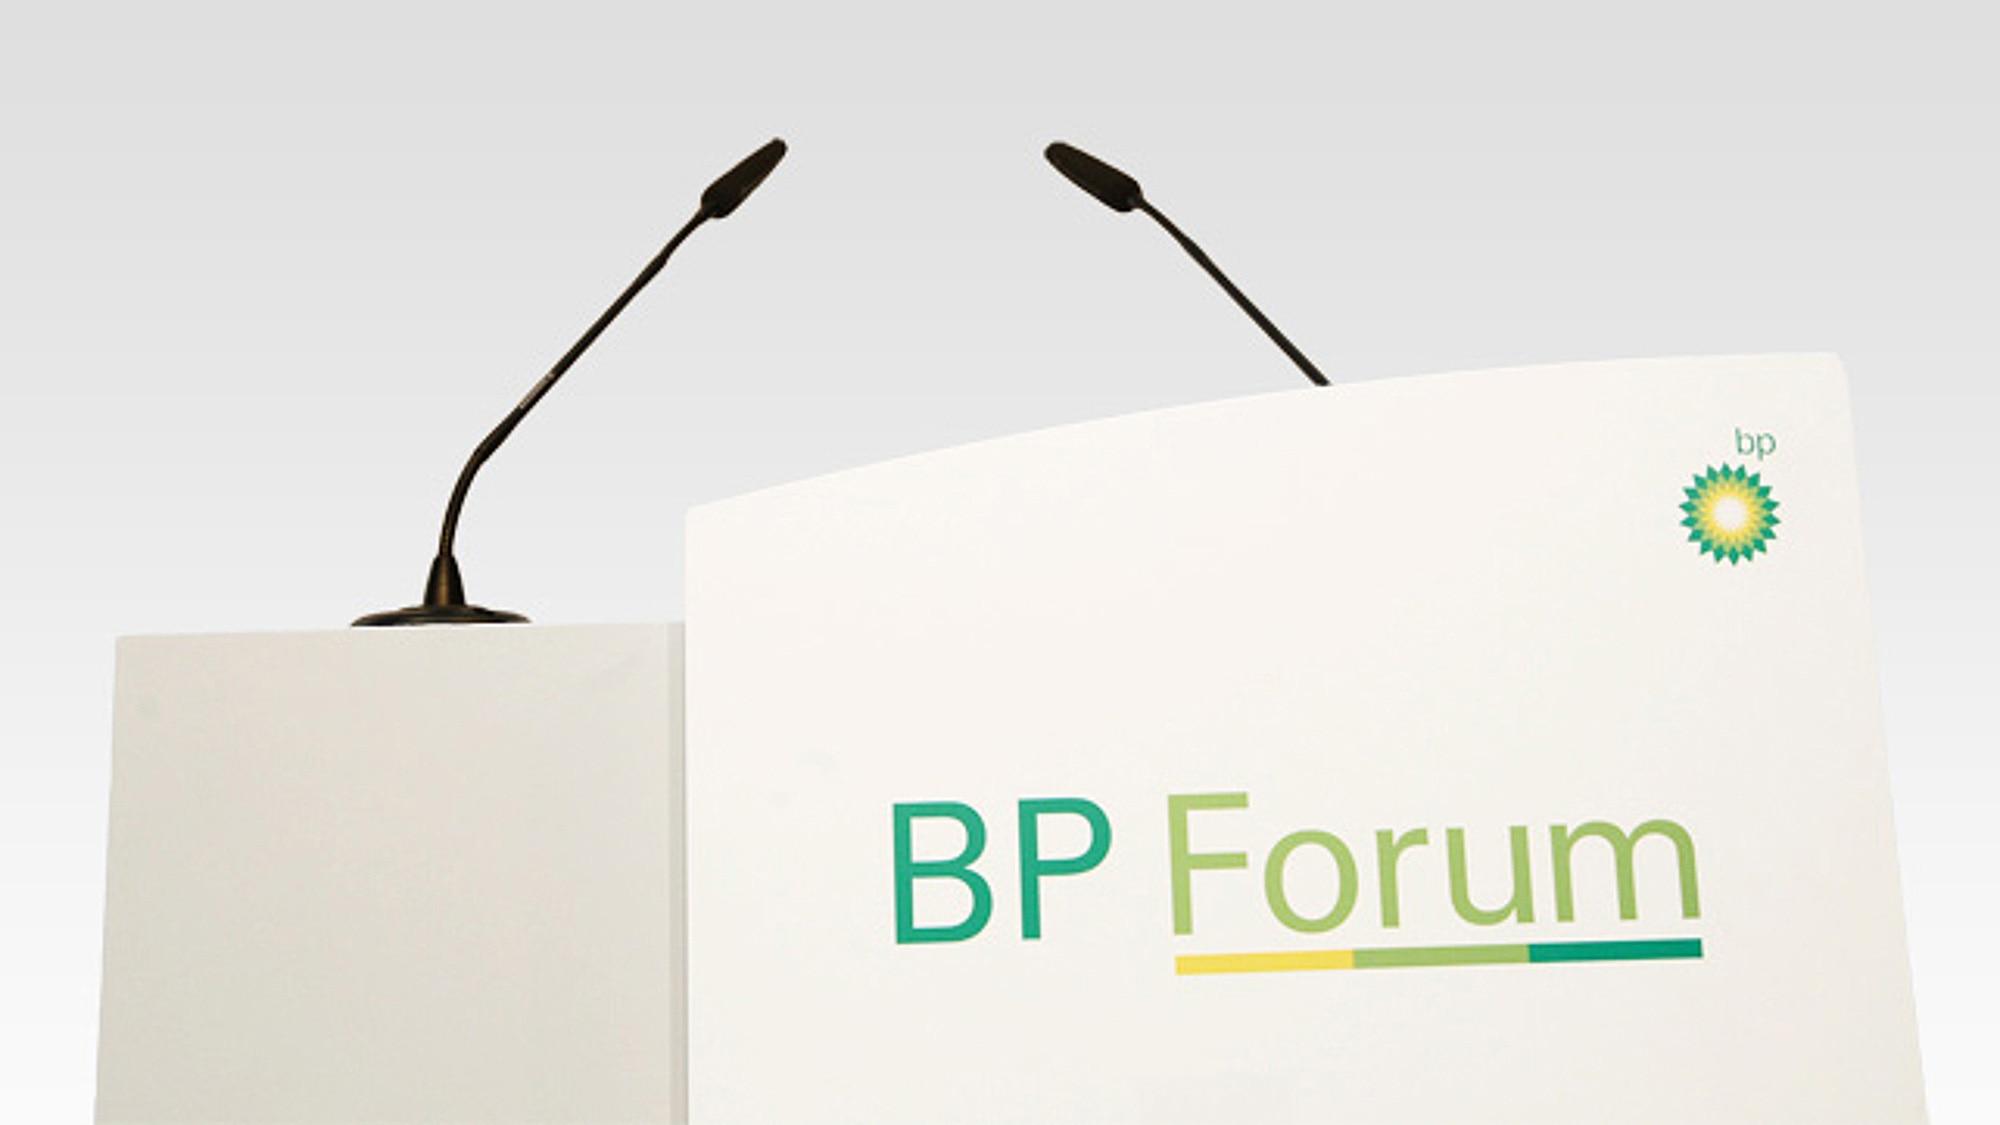 bp forum gesellschaft bp in deutschland. Black Bedroom Furniture Sets. Home Design Ideas